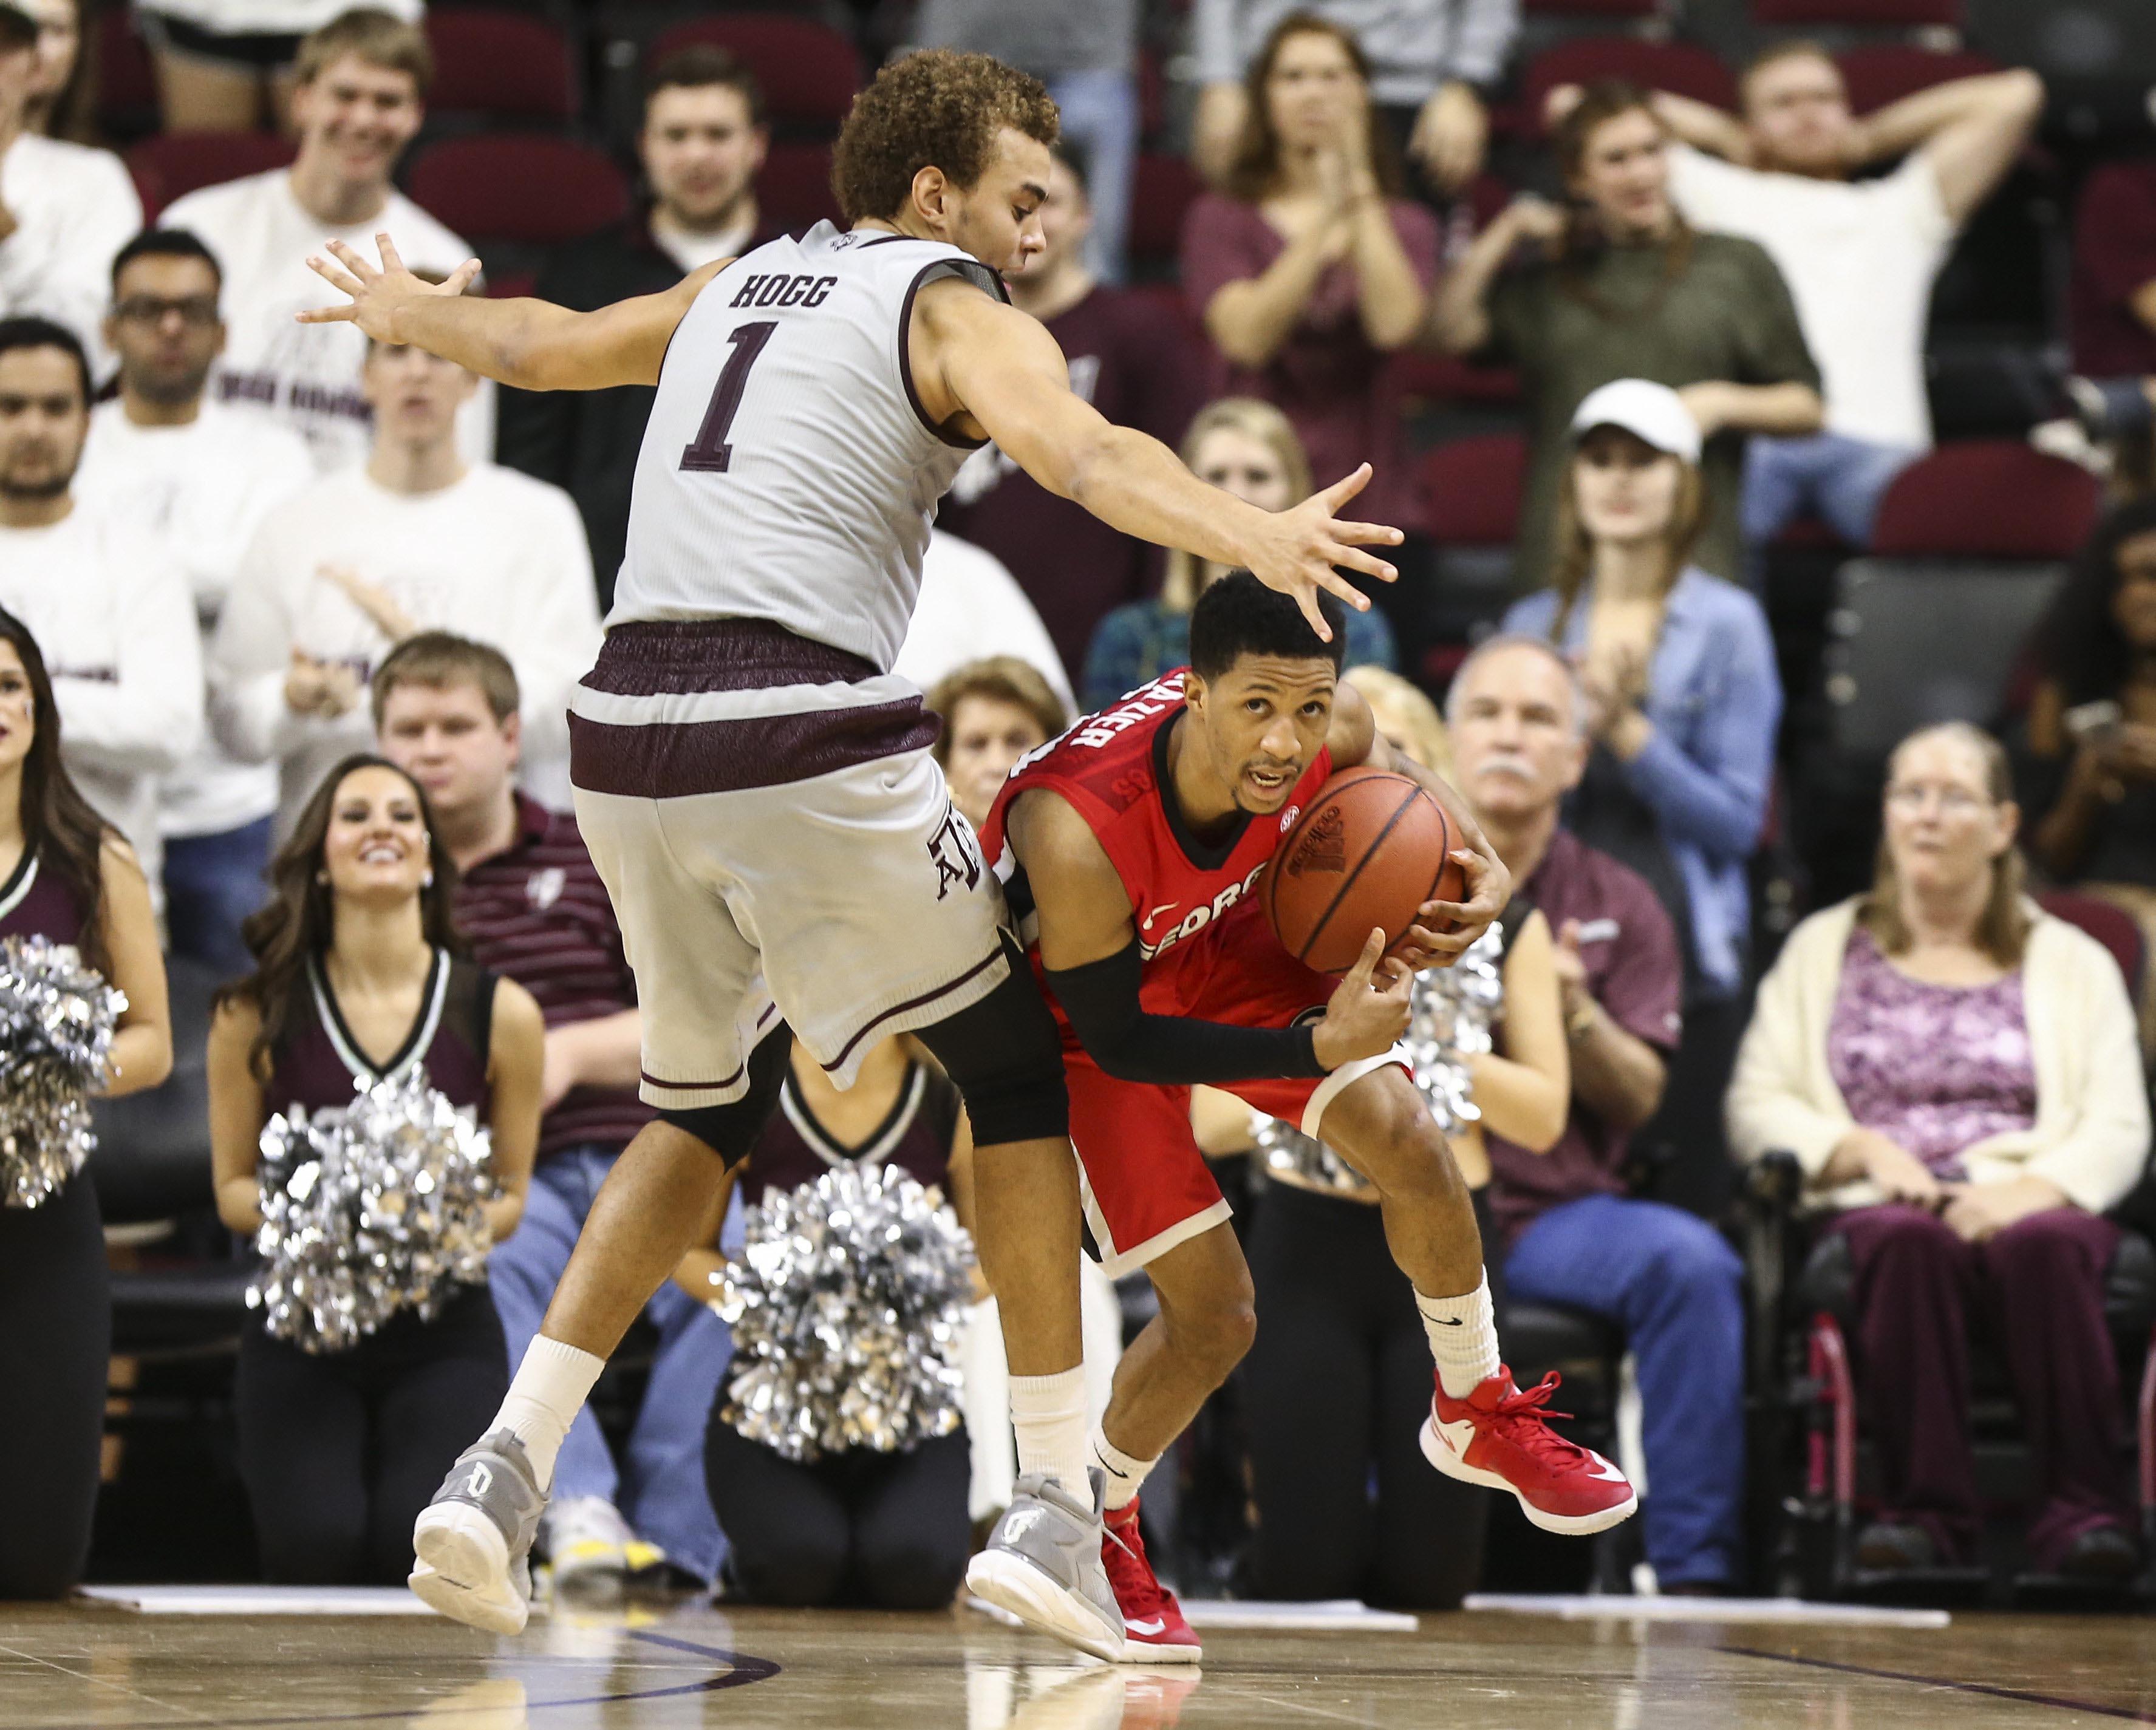 9827155-ncaa-basketball-georgia-at-texas-aampampm